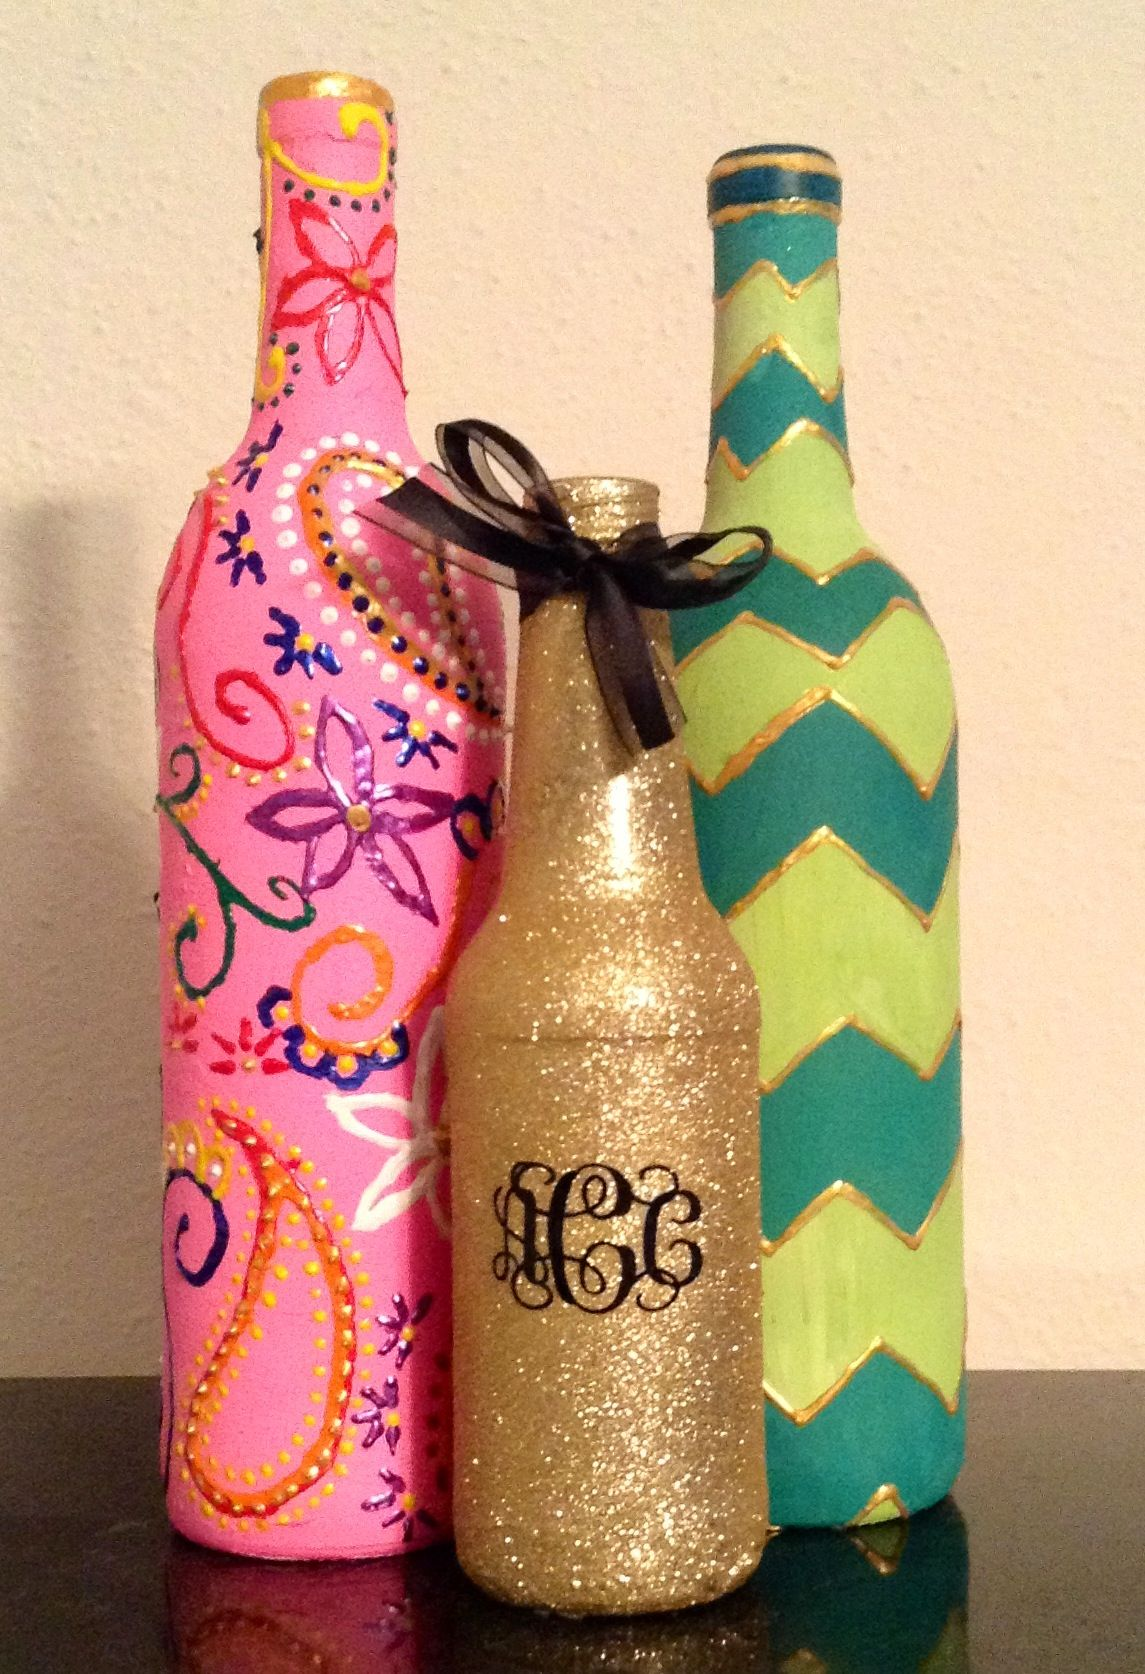 DIY Painted wine bottles. Floral, glitter monogram, and